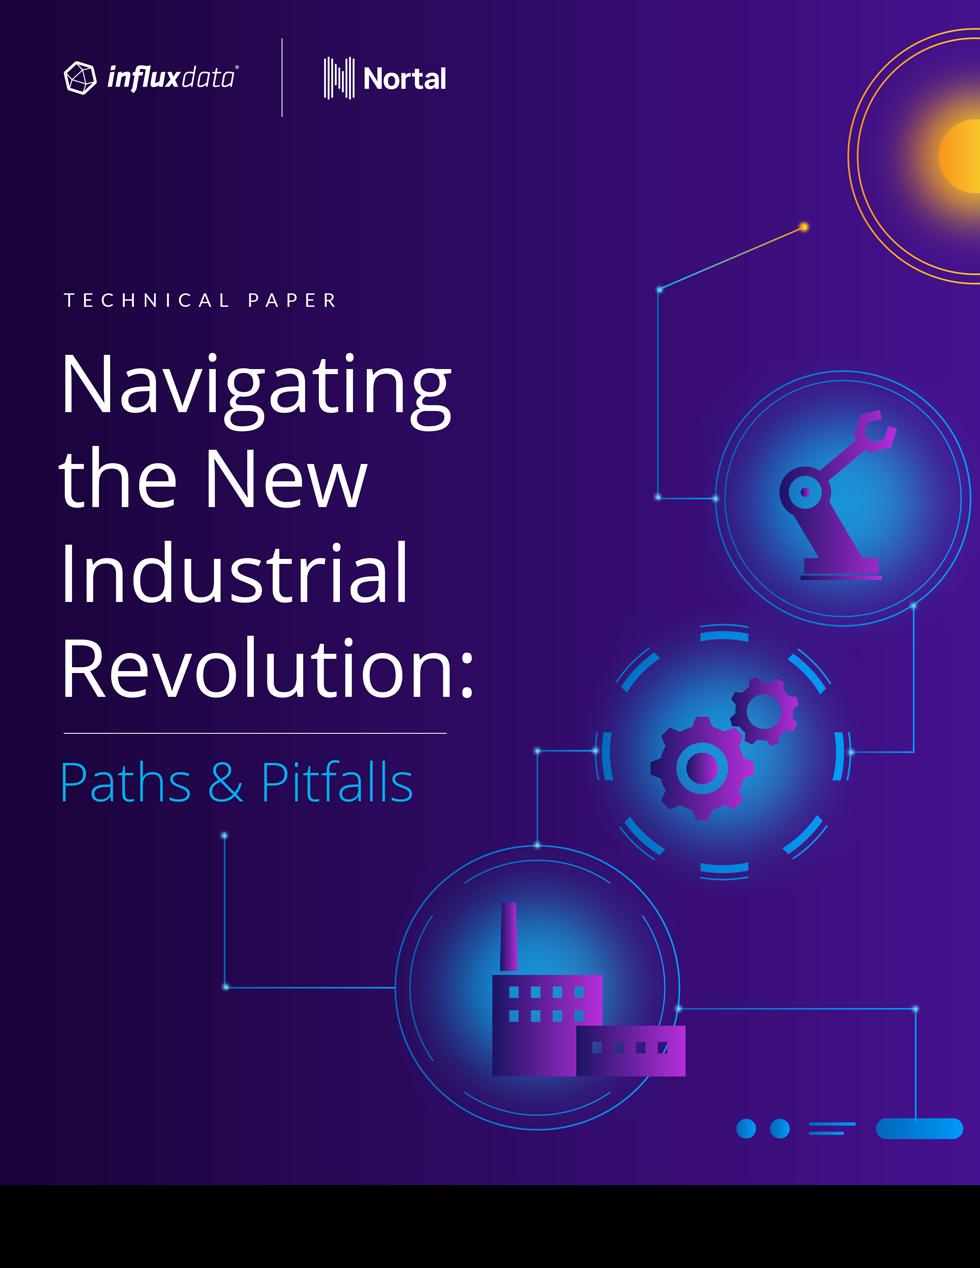 Navigating the New Industrial Revolution: Paths & Pitfalls